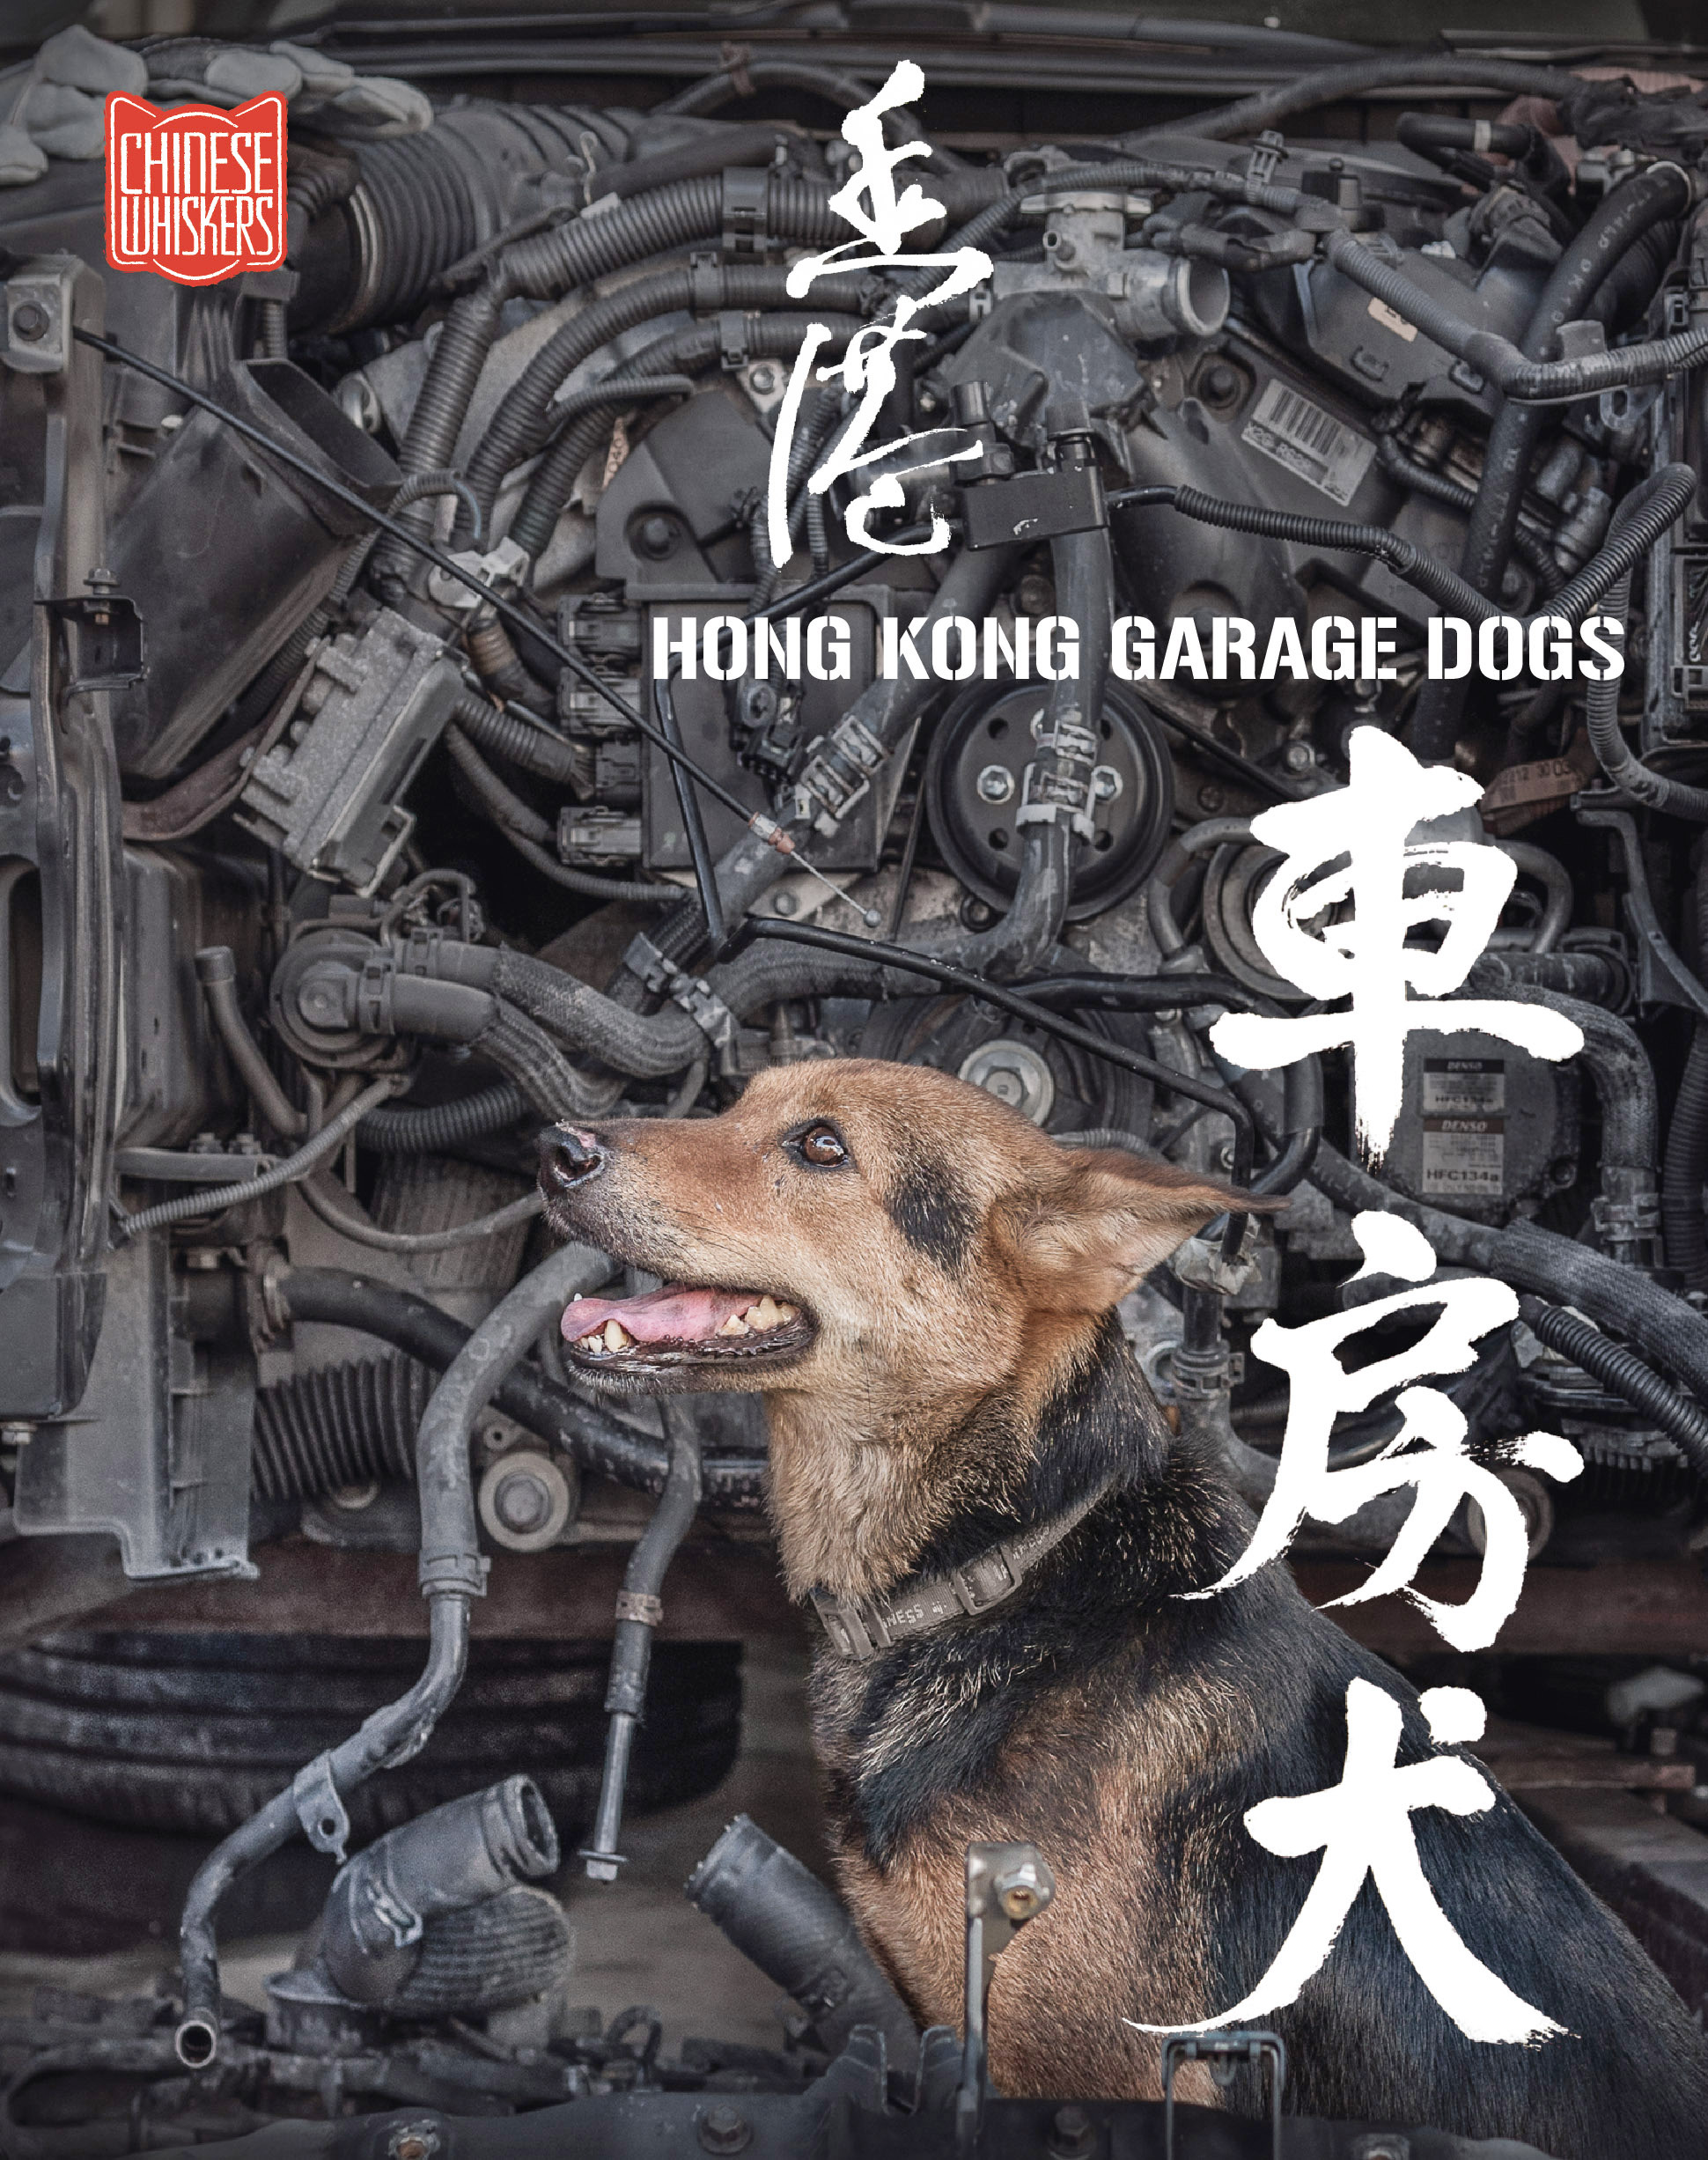 00 HK Garage Dogs book cover flat.jpg